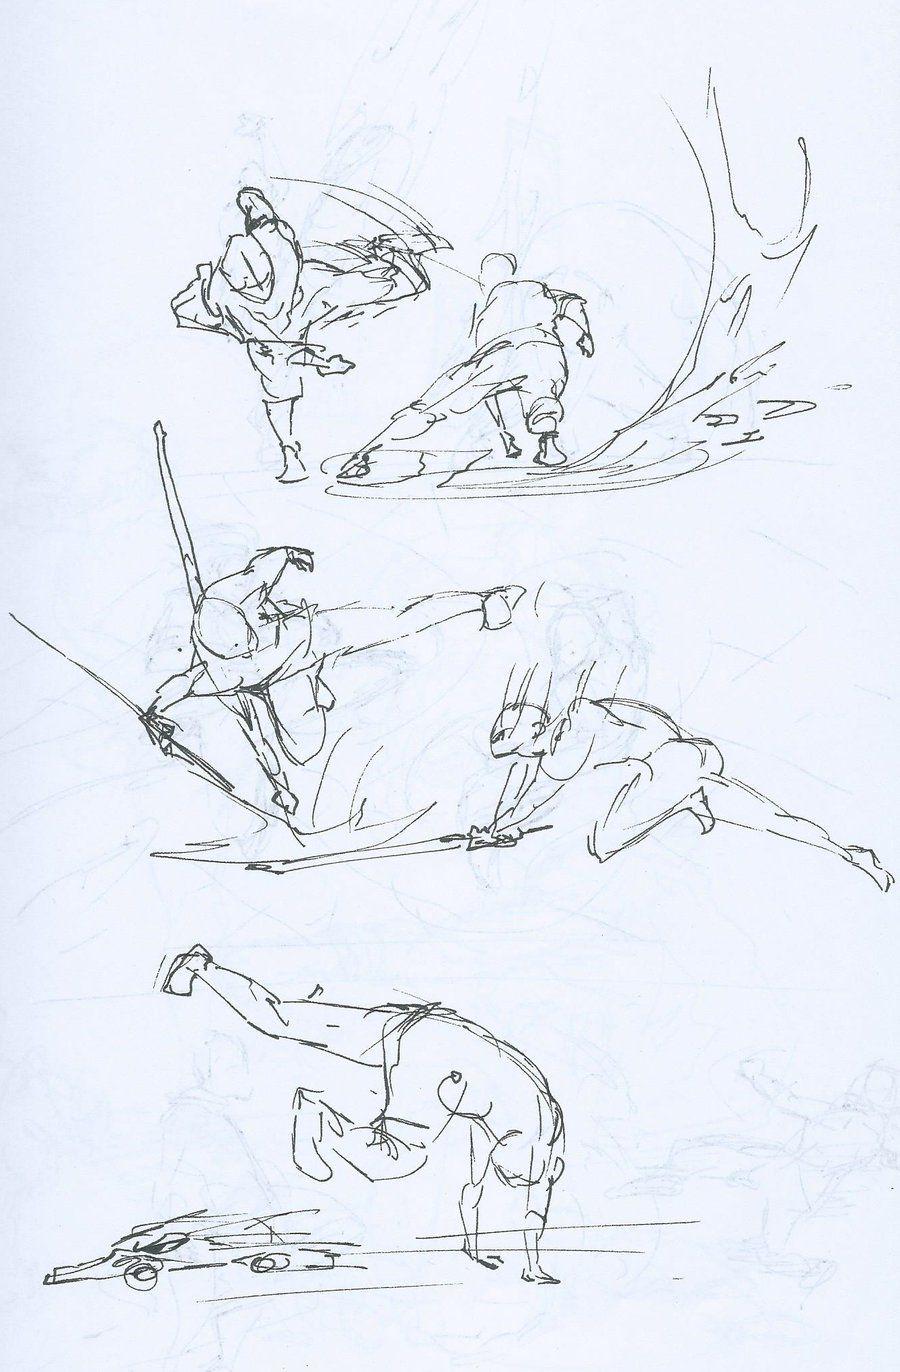 Manga Fight Scene Art Manga Fight In 2020 Art Reference Poses Art Poses Fighting Drawing